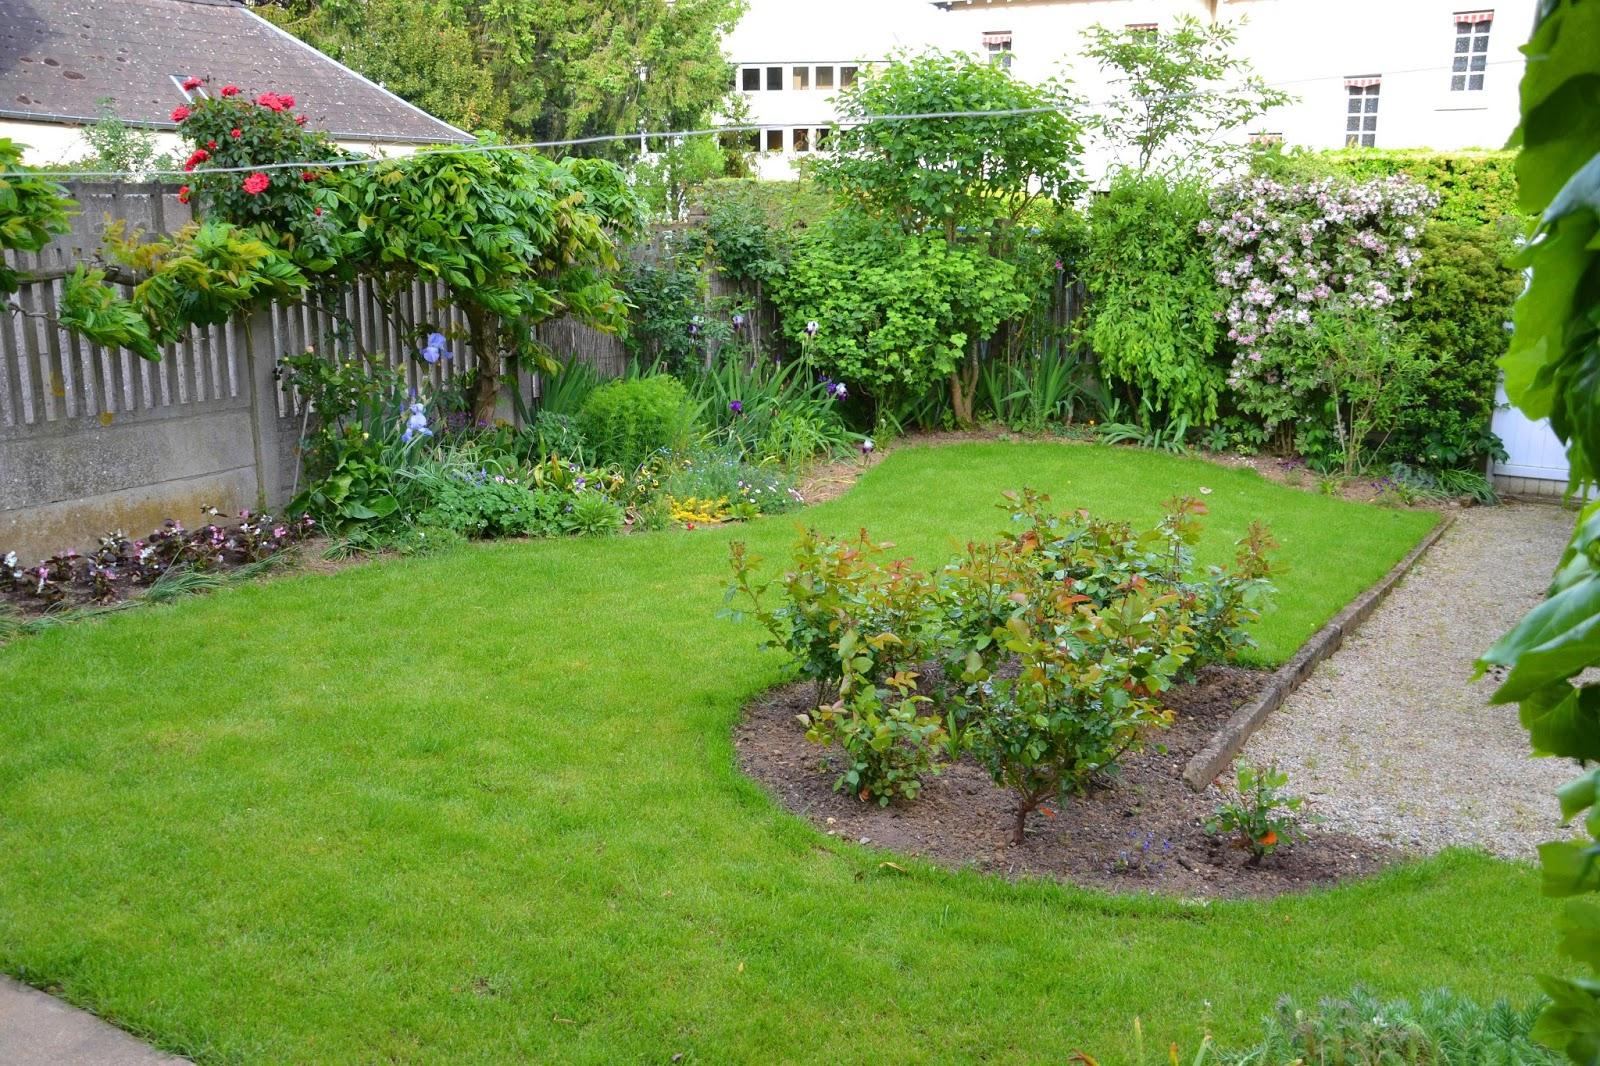 lesjardinsdaurelien petit jardin de ville massifs rosiers et gazon. Black Bedroom Furniture Sets. Home Design Ideas